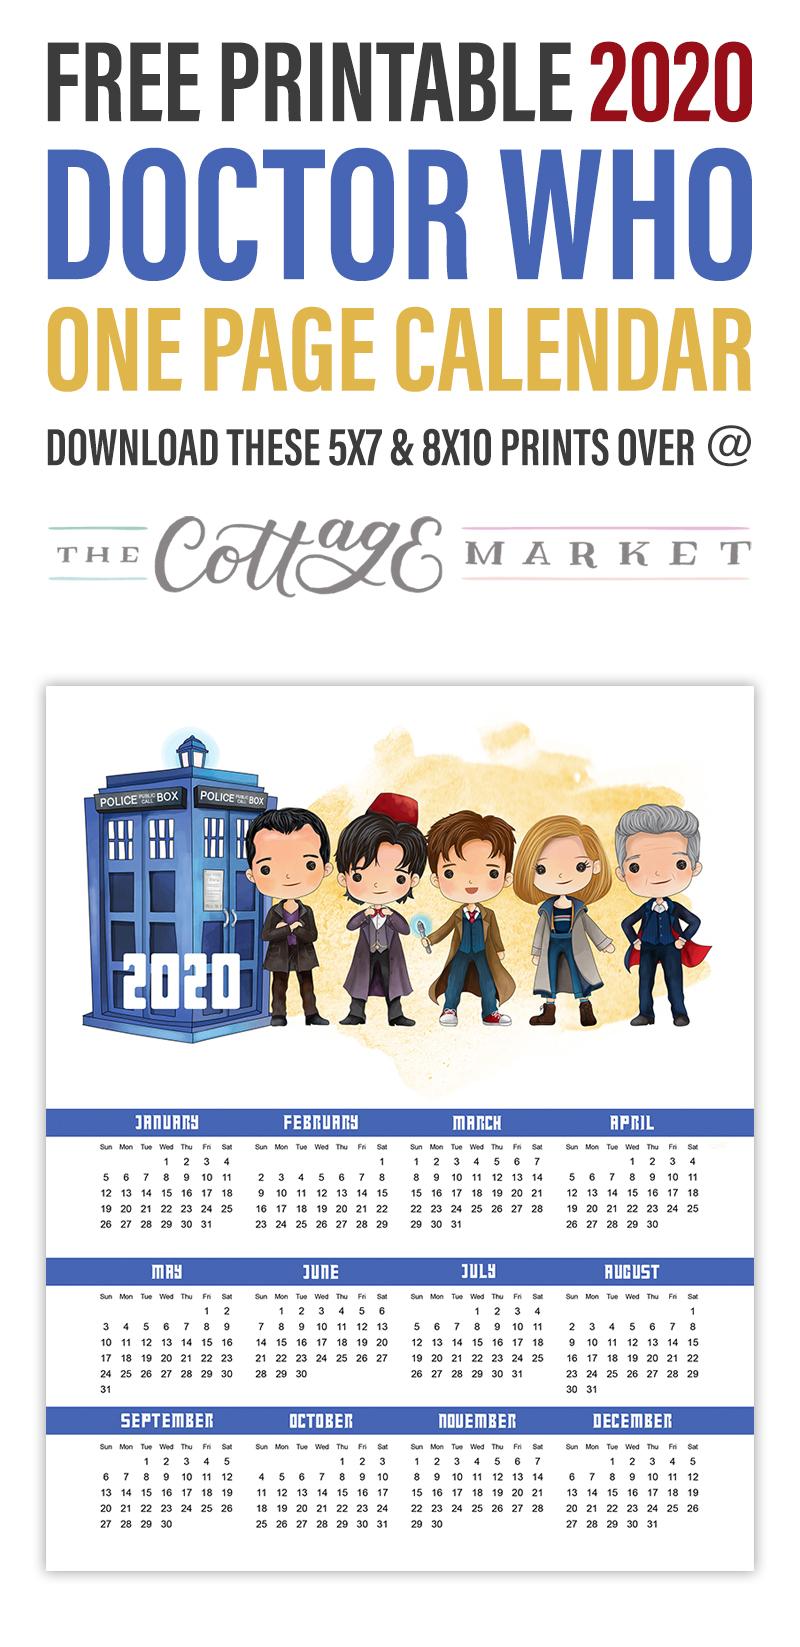 https://thecottagemarket.com/wp-content/uploads/2019/11/TCM-DoctorWho-OnePage-2020-Calendar-T-1.jpg